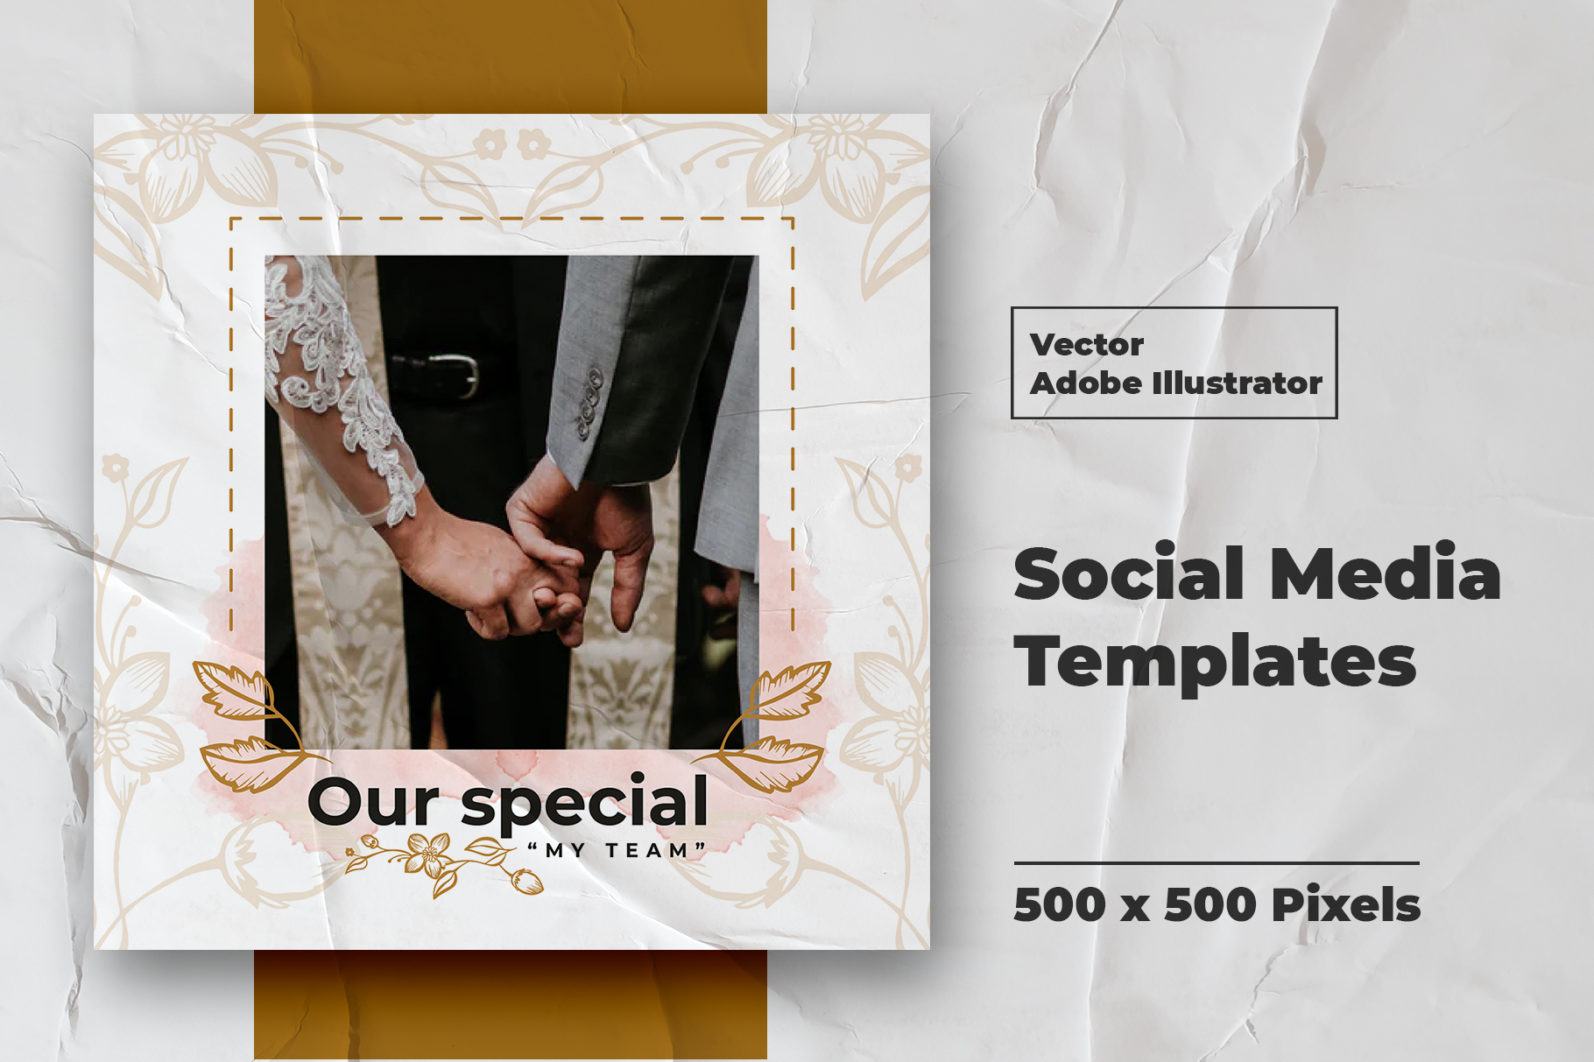 Wedding Instagram Feed Vector - 3 78 -